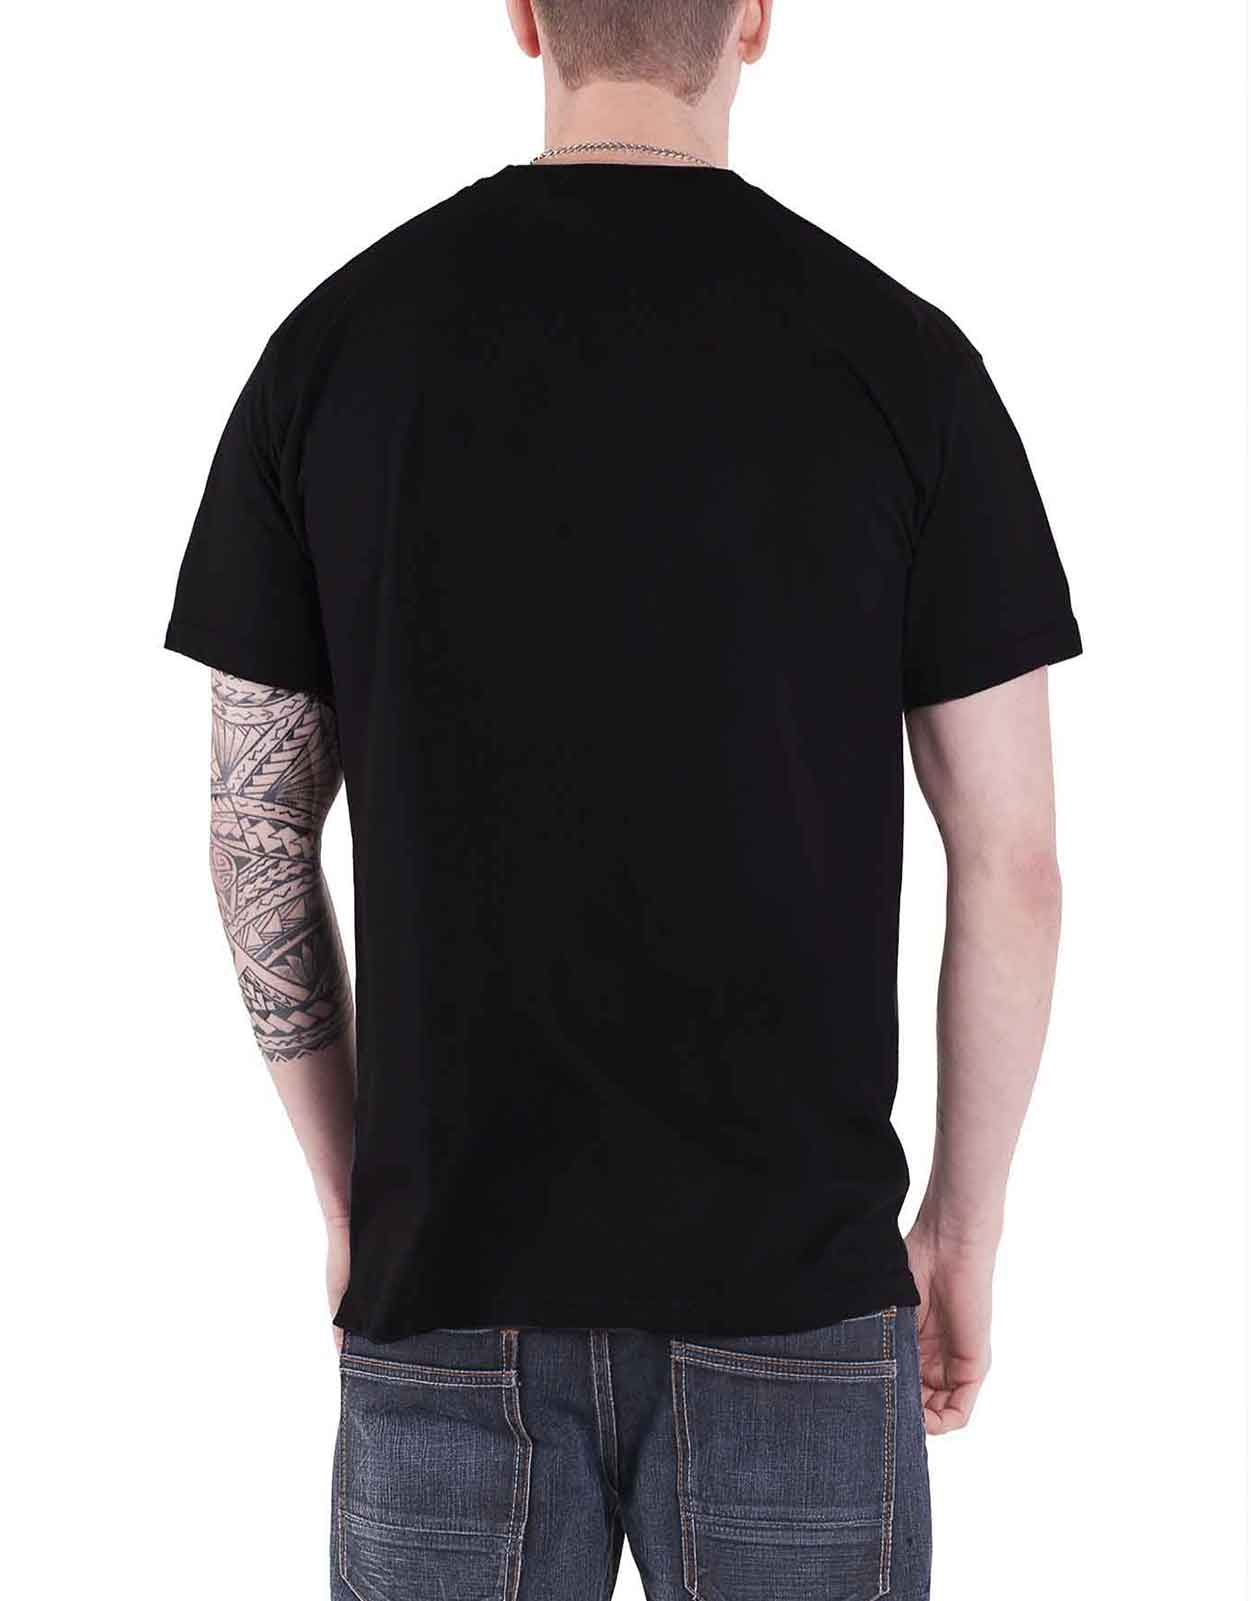 Motorhead-T-Shirt-Lemmy-RIP-England-warpig-clean-your-clock-official-new-mens Indexbild 49